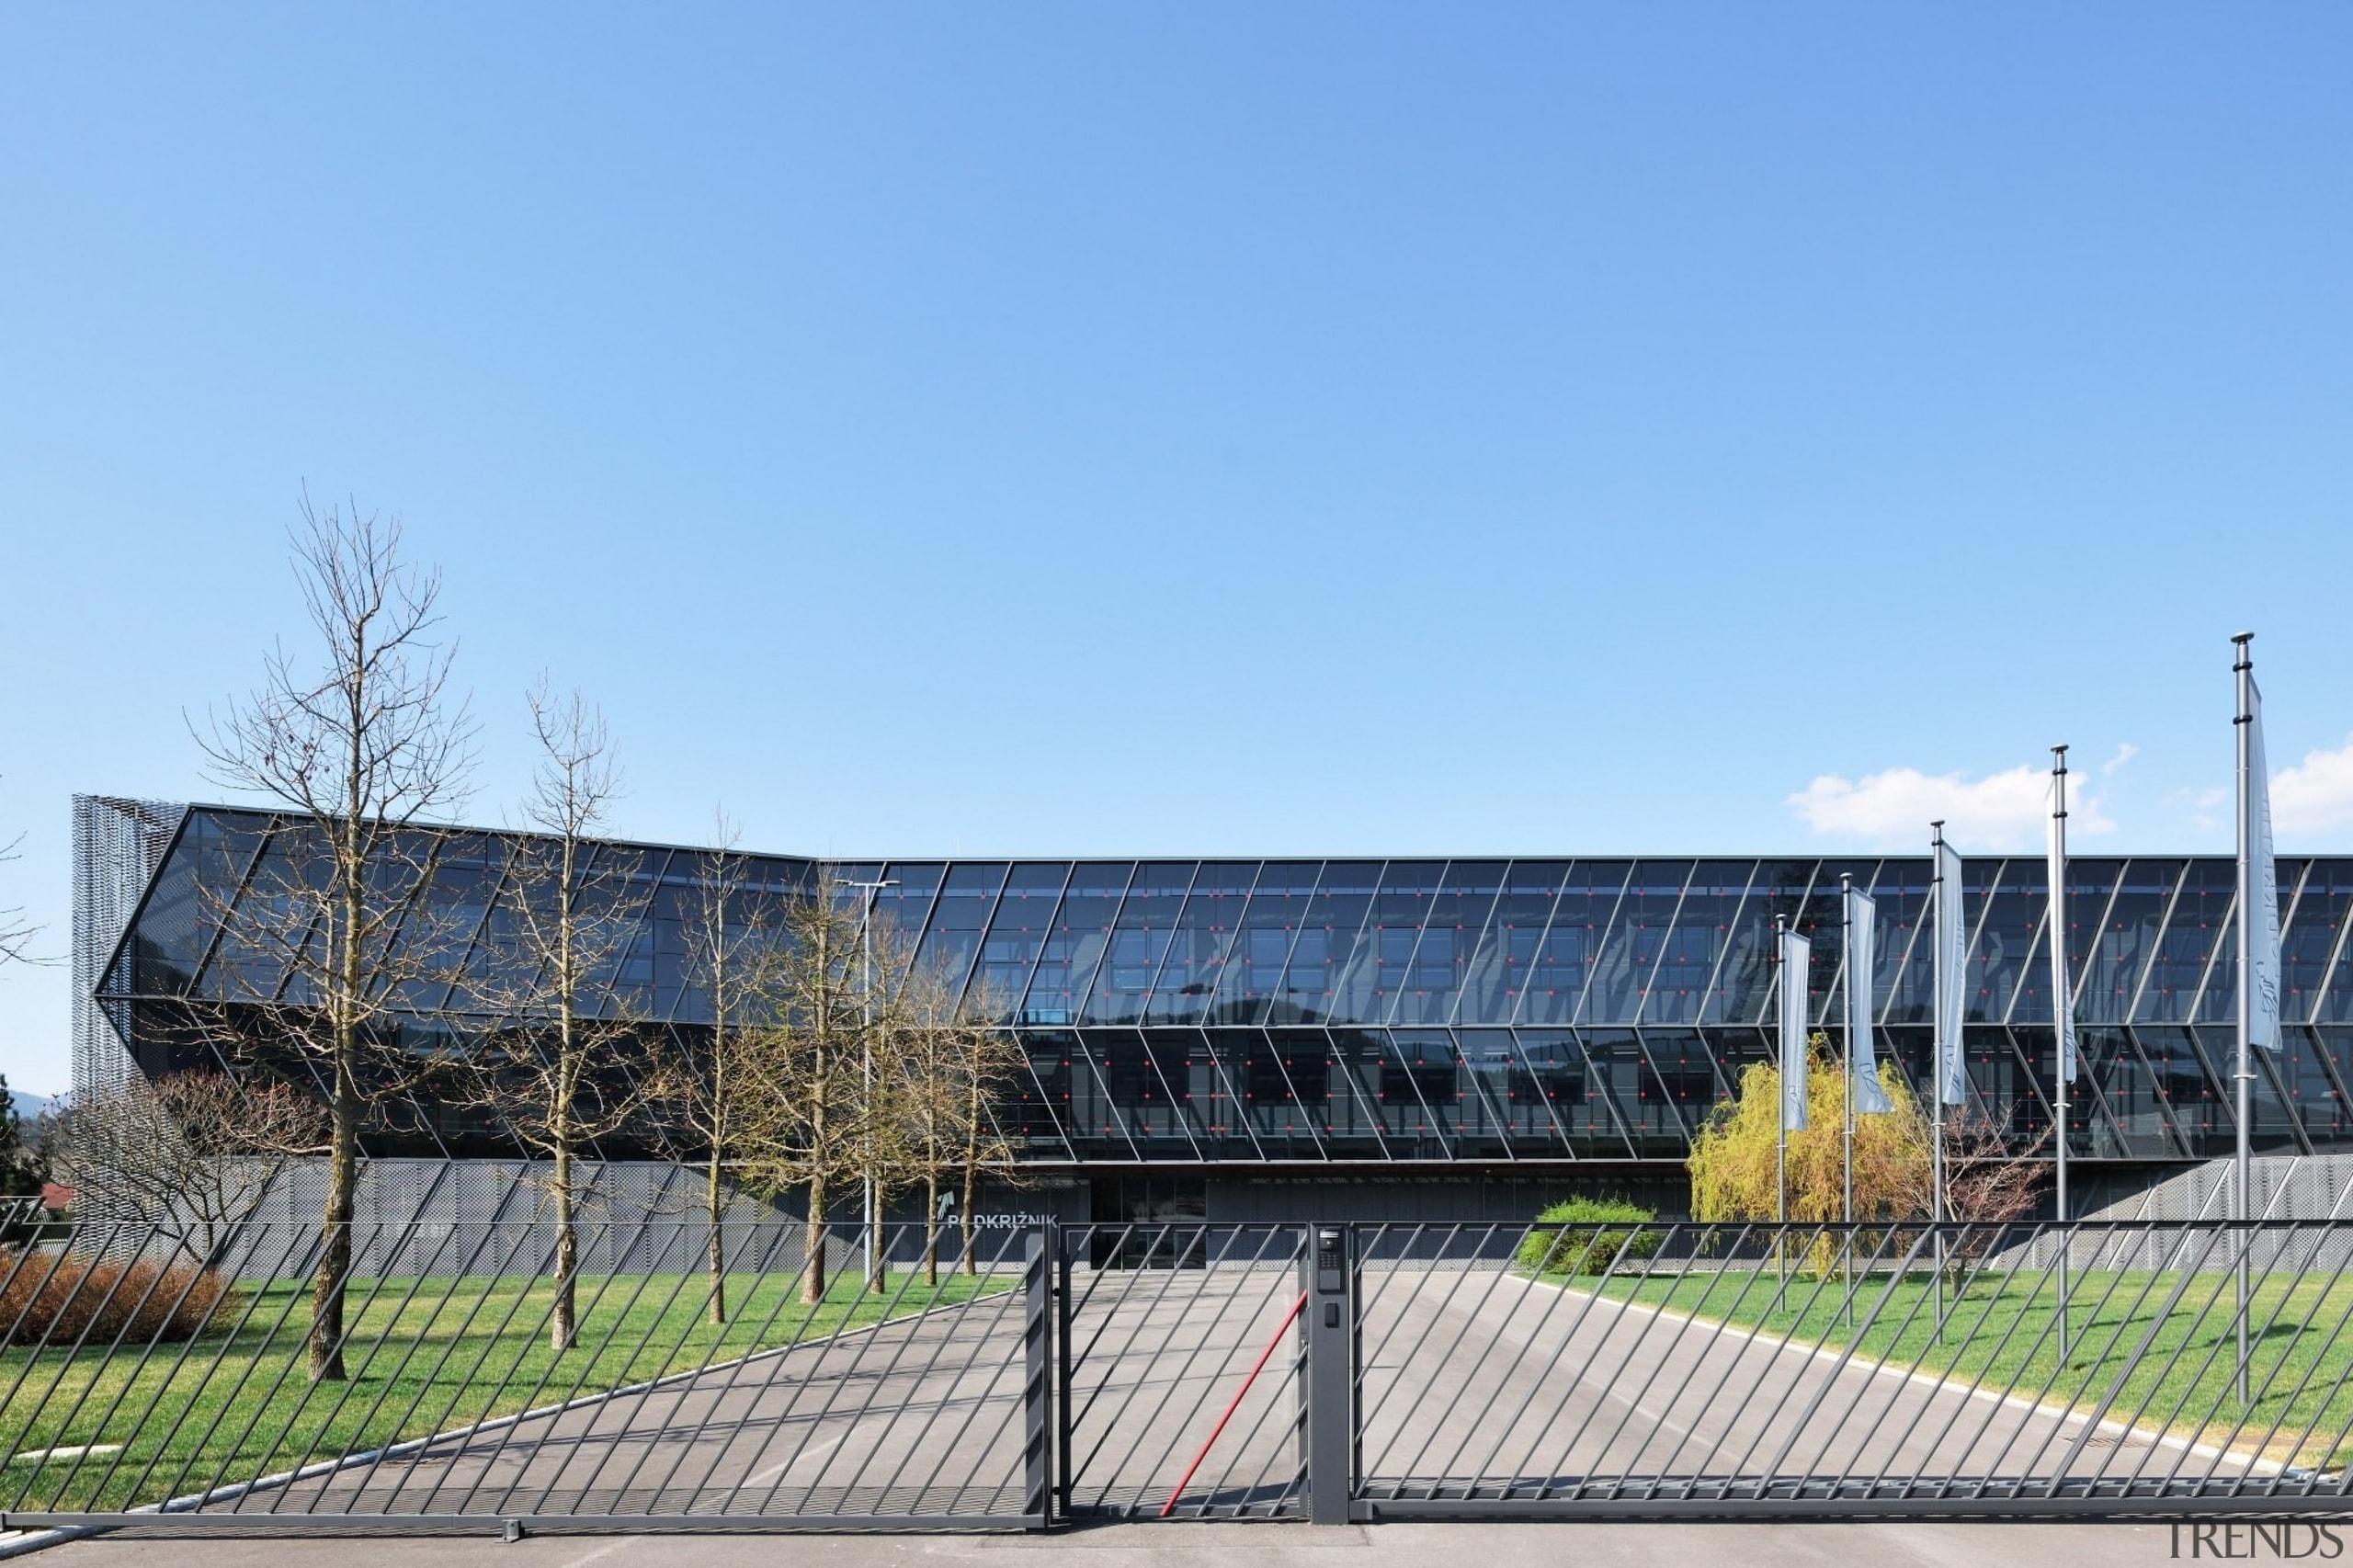 Architect: SuperformPhotography by Miran Kambič architecture, building, corporate headquarters, facade, sky, sport venue, stadium, structure, teal